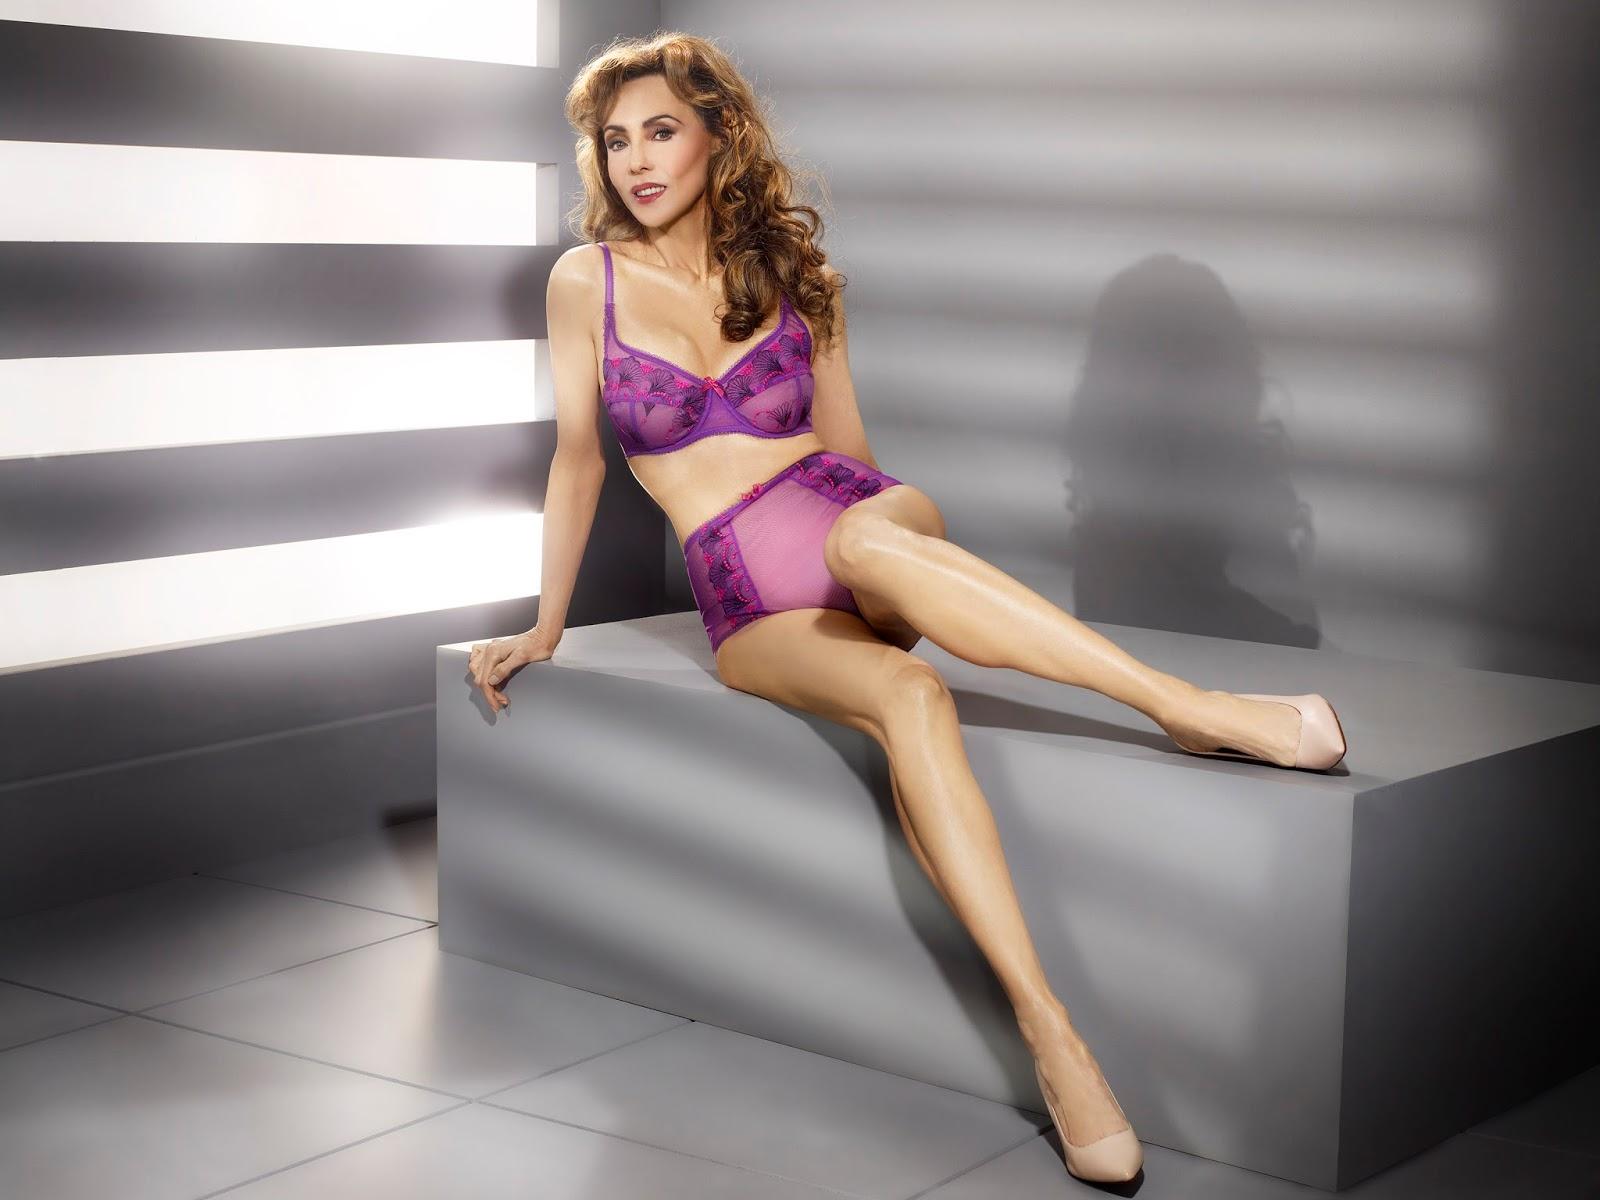 always aliza's new face #diversity #lingerie - chloepierreldn